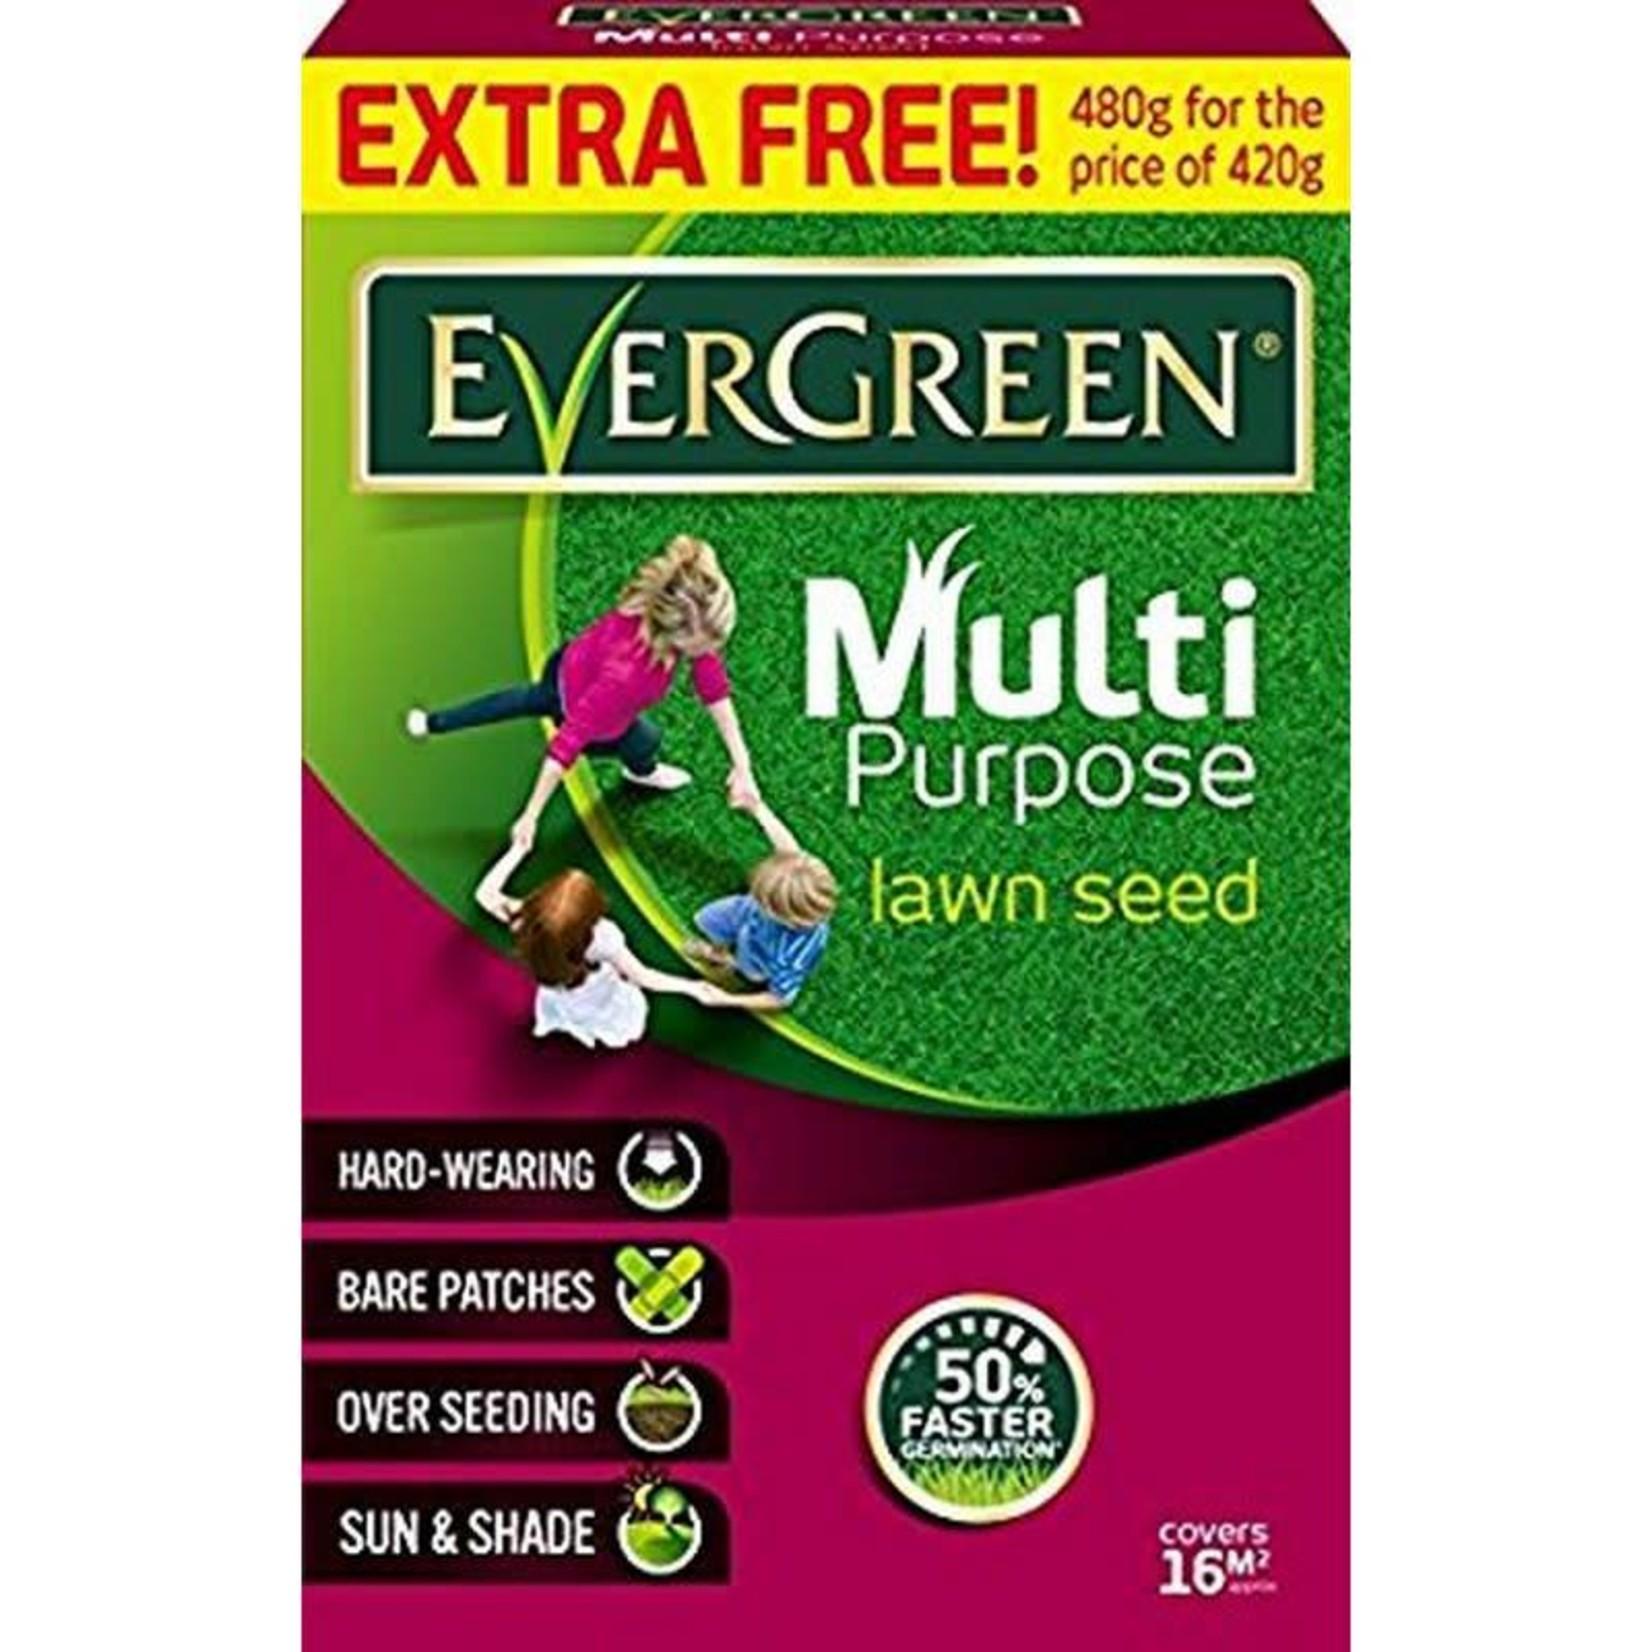 EVERGREEN MULTI-PURPOSE GRASS SEED 480g